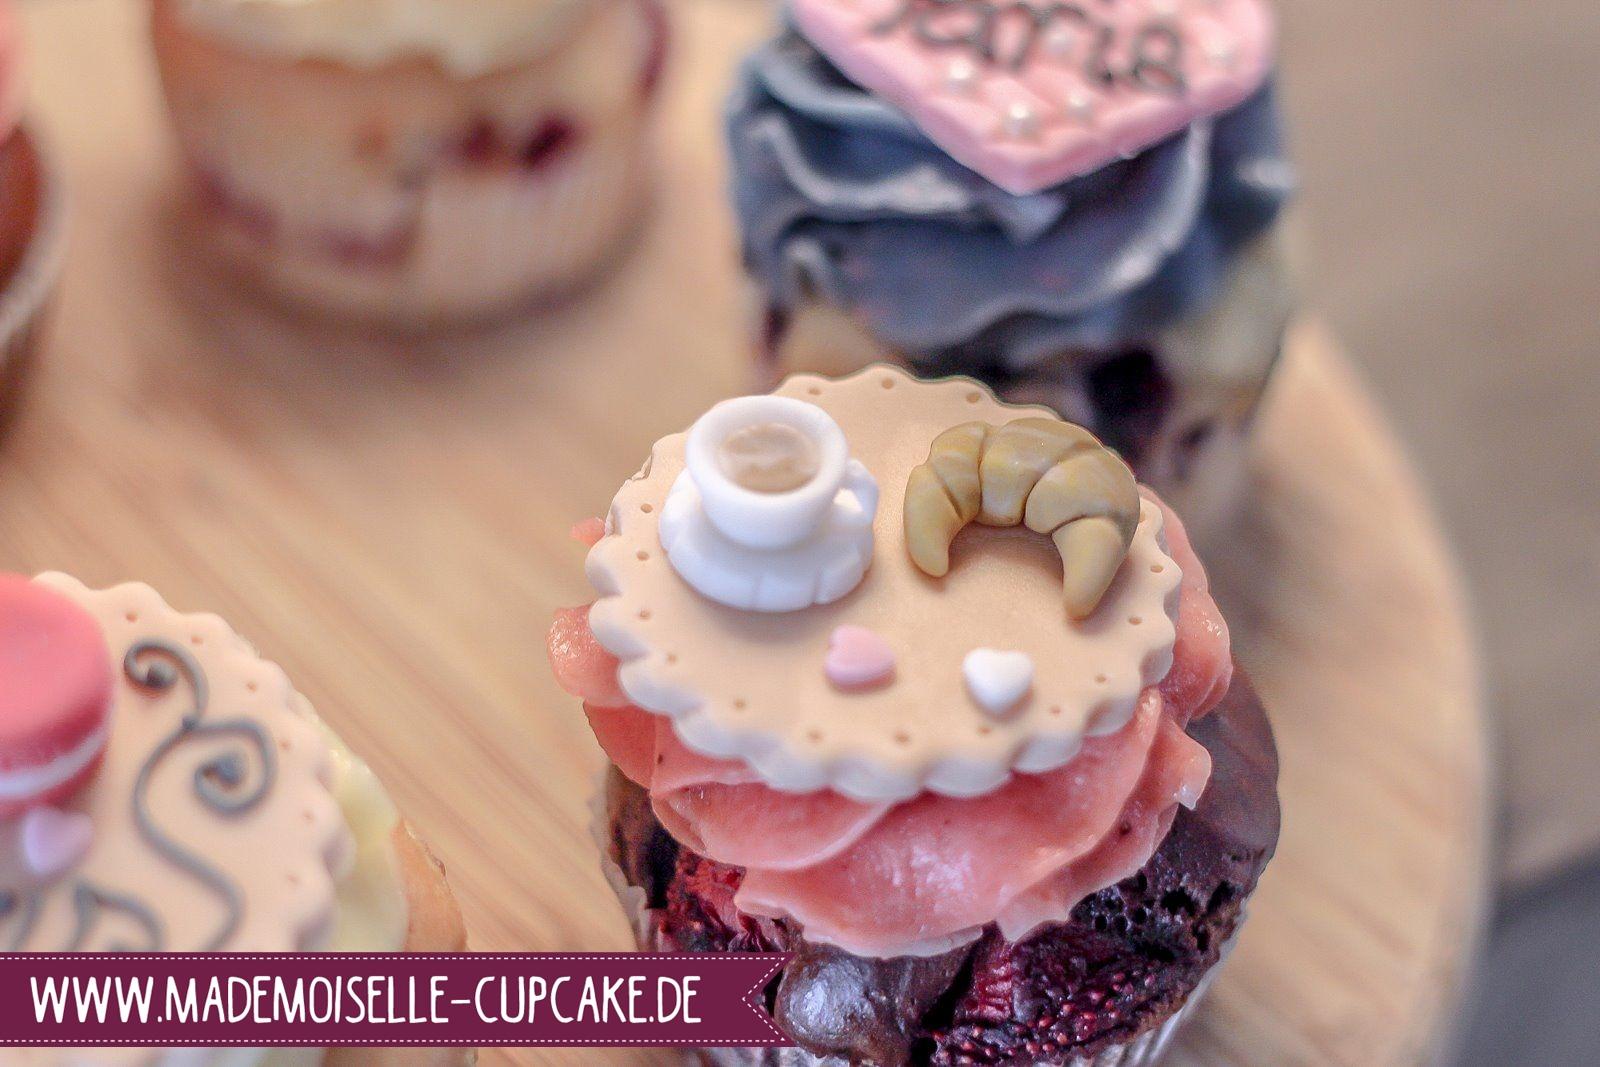 Paris Mademoiselle Cupcake